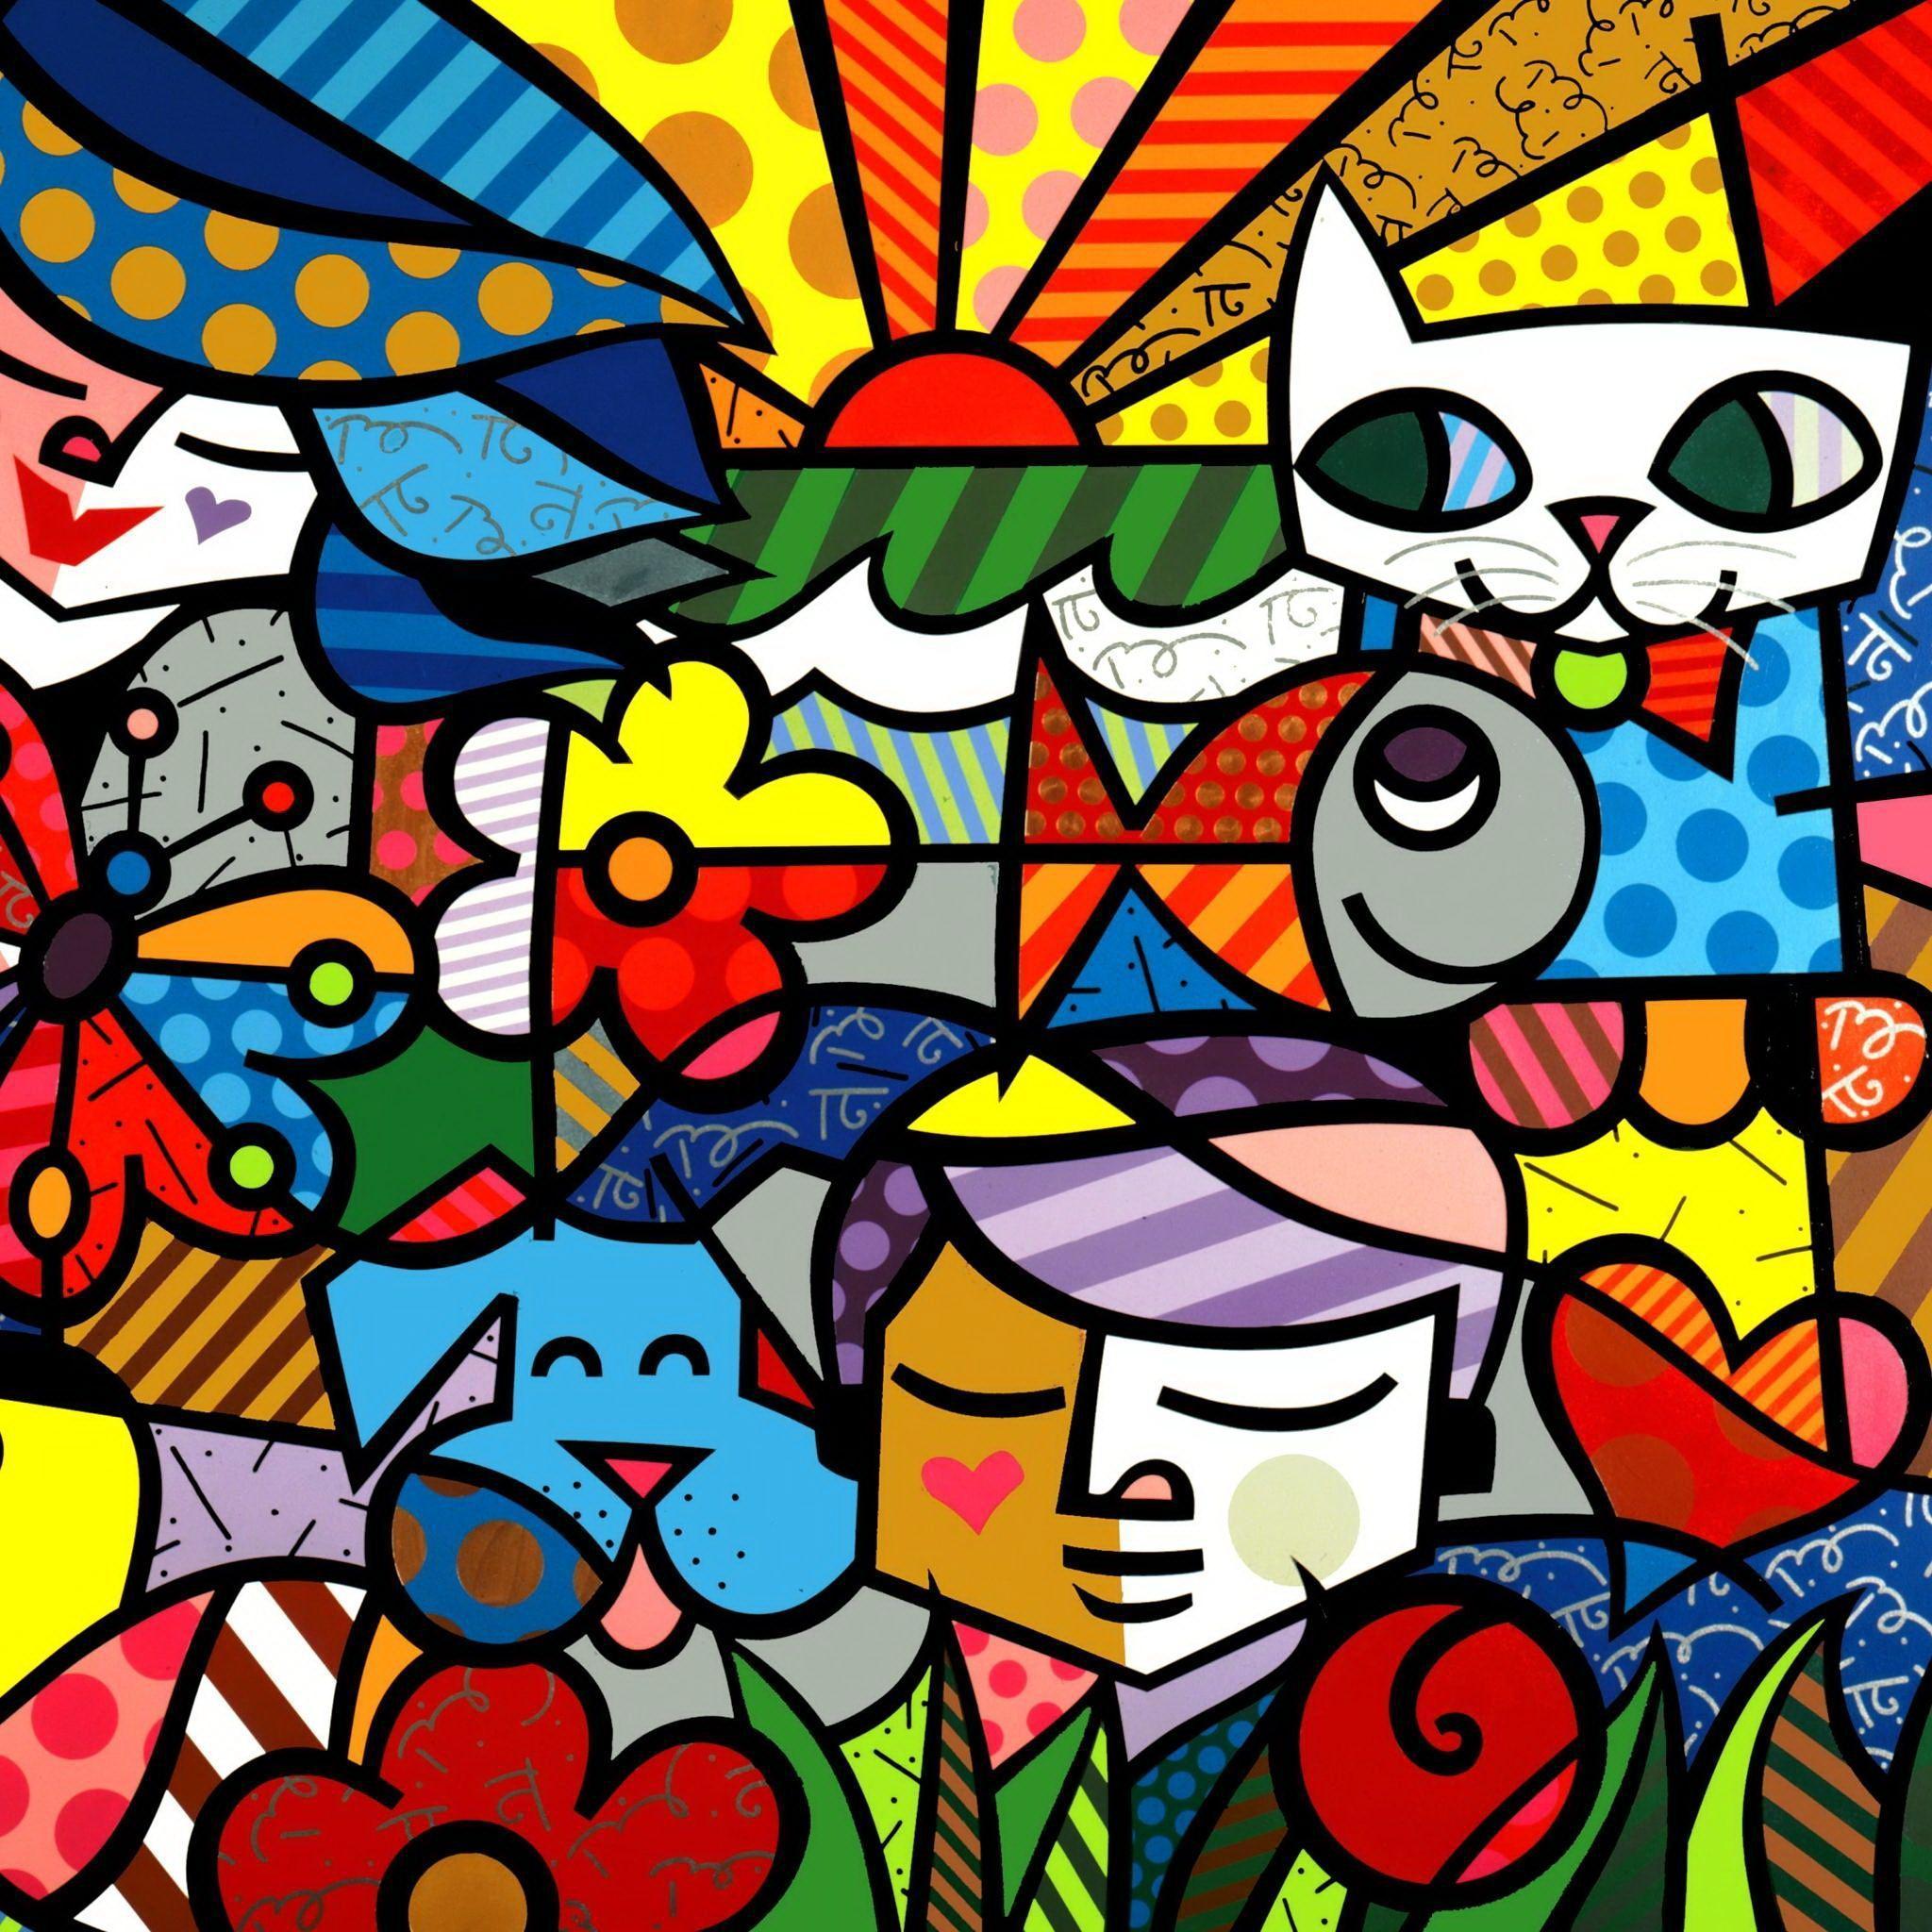 Abstract Pop Art Wallpapers - Top Free Abstract Pop Art ...